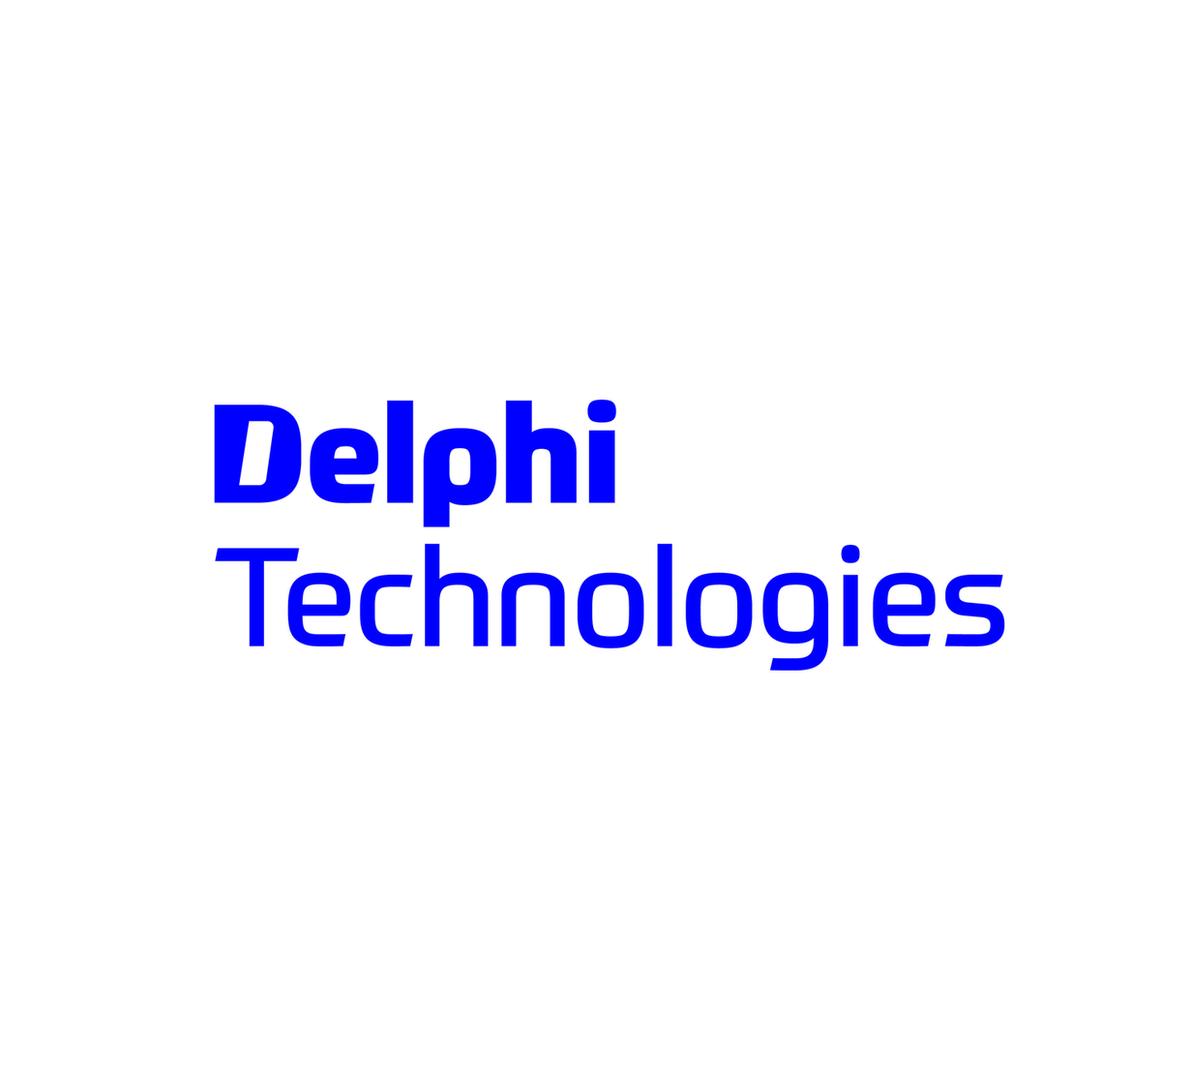 delphi_technologies_logo.png